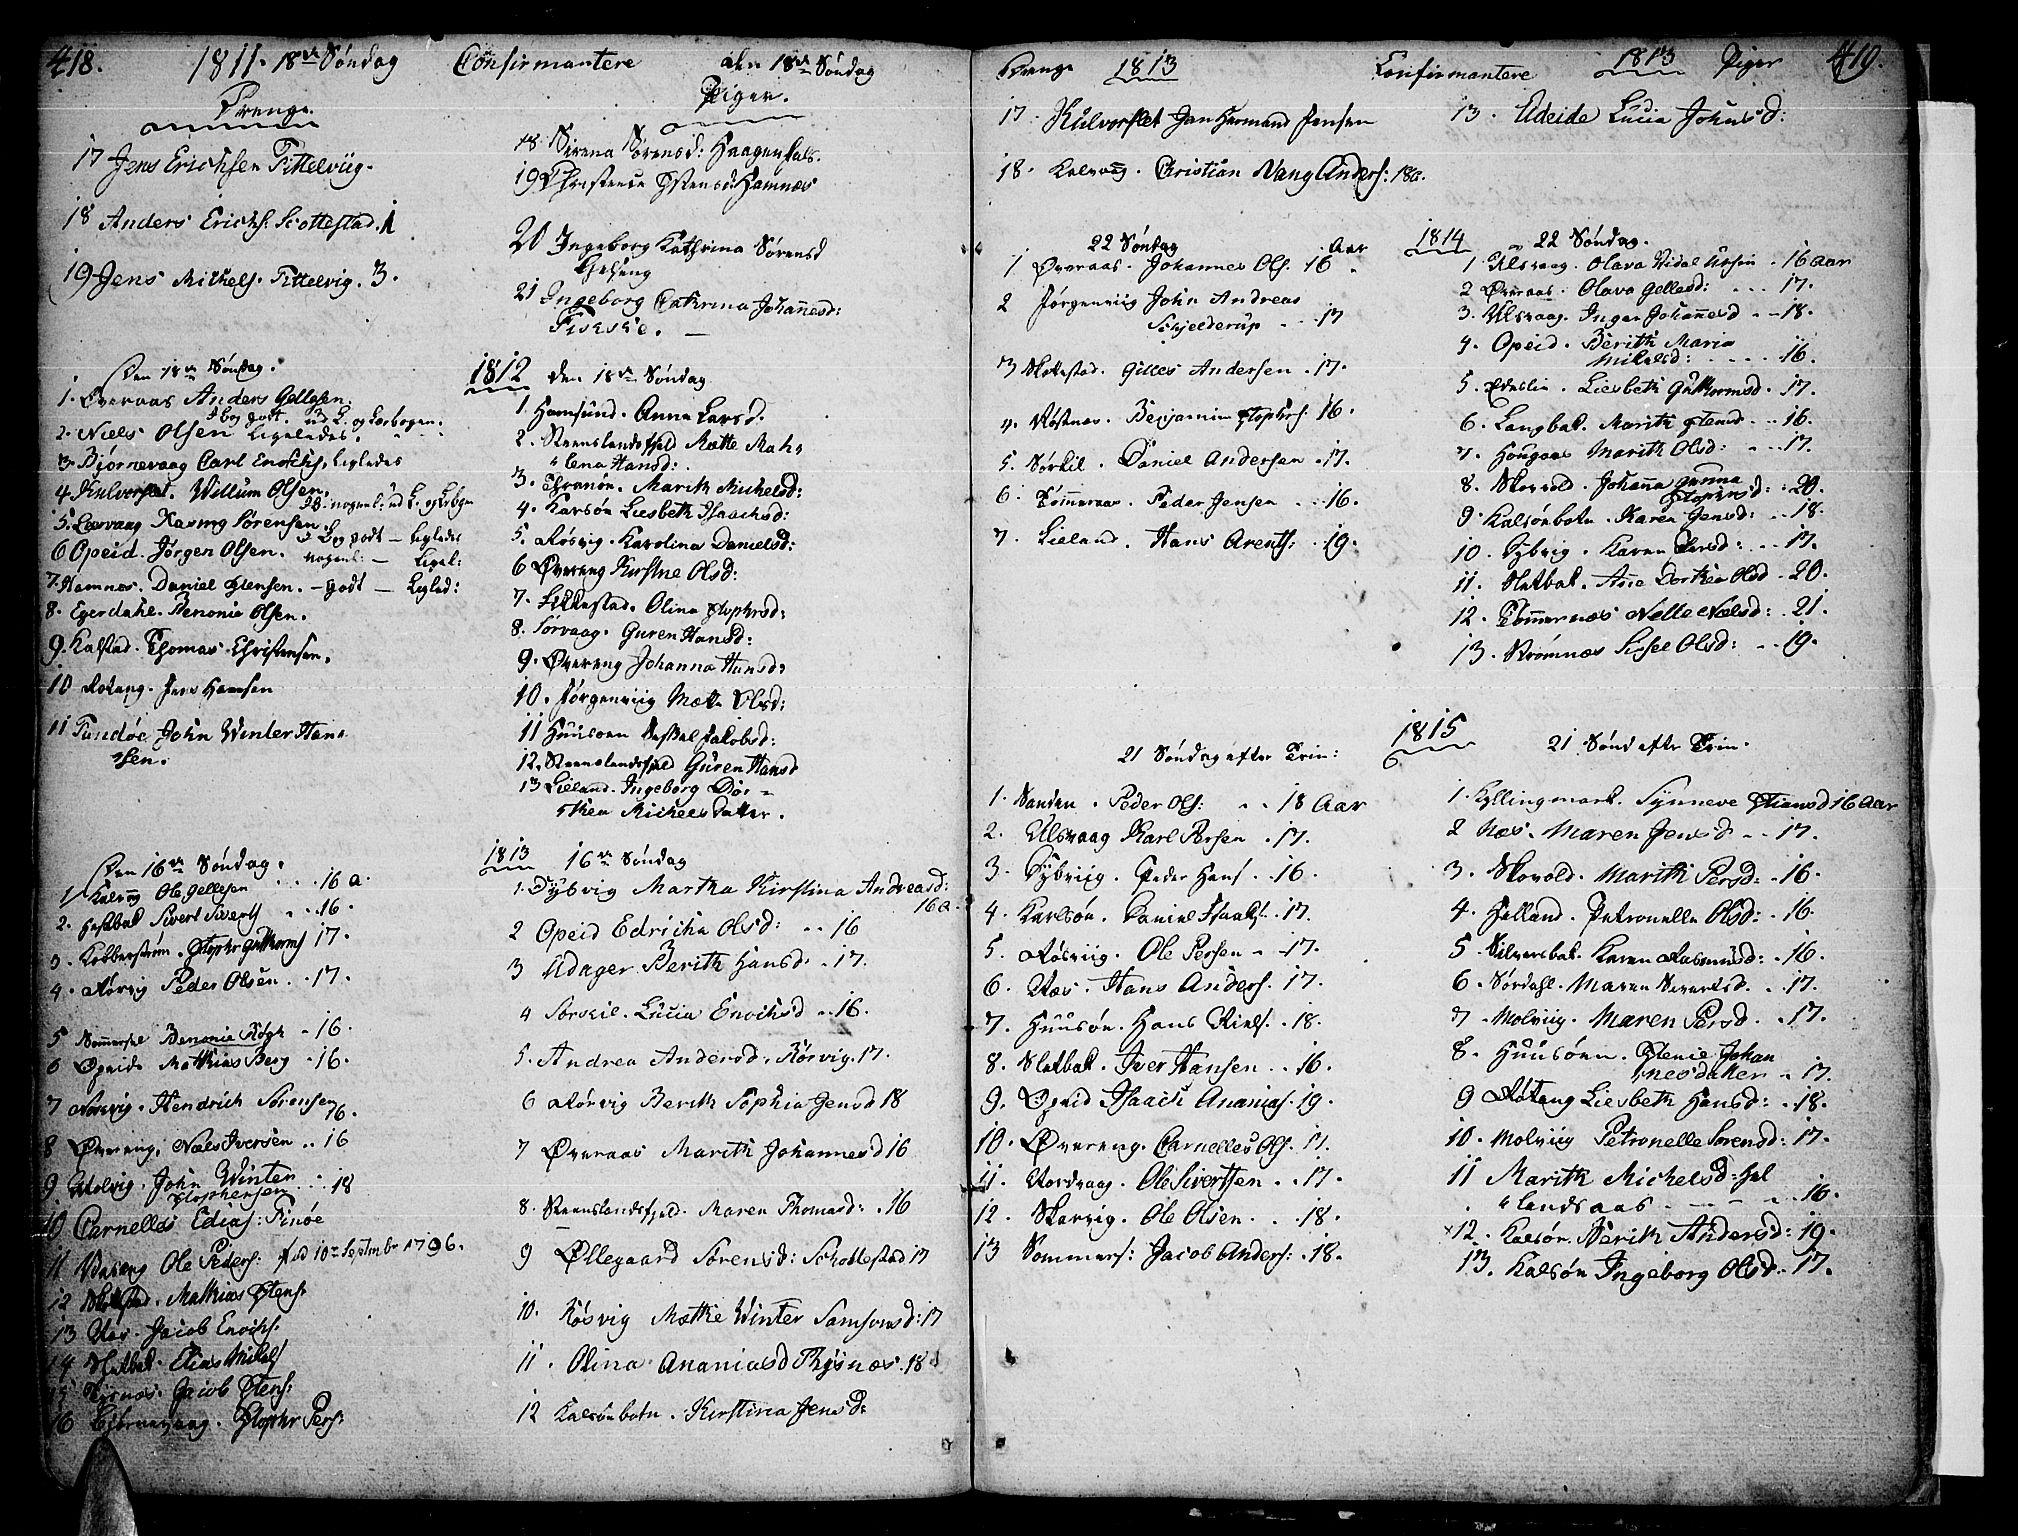 SAT, Ministerialprotokoller, klokkerbøker og fødselsregistre - Nordland, 859/L0841: Ministerialbok nr. 859A01, 1766-1821, s. 418-419